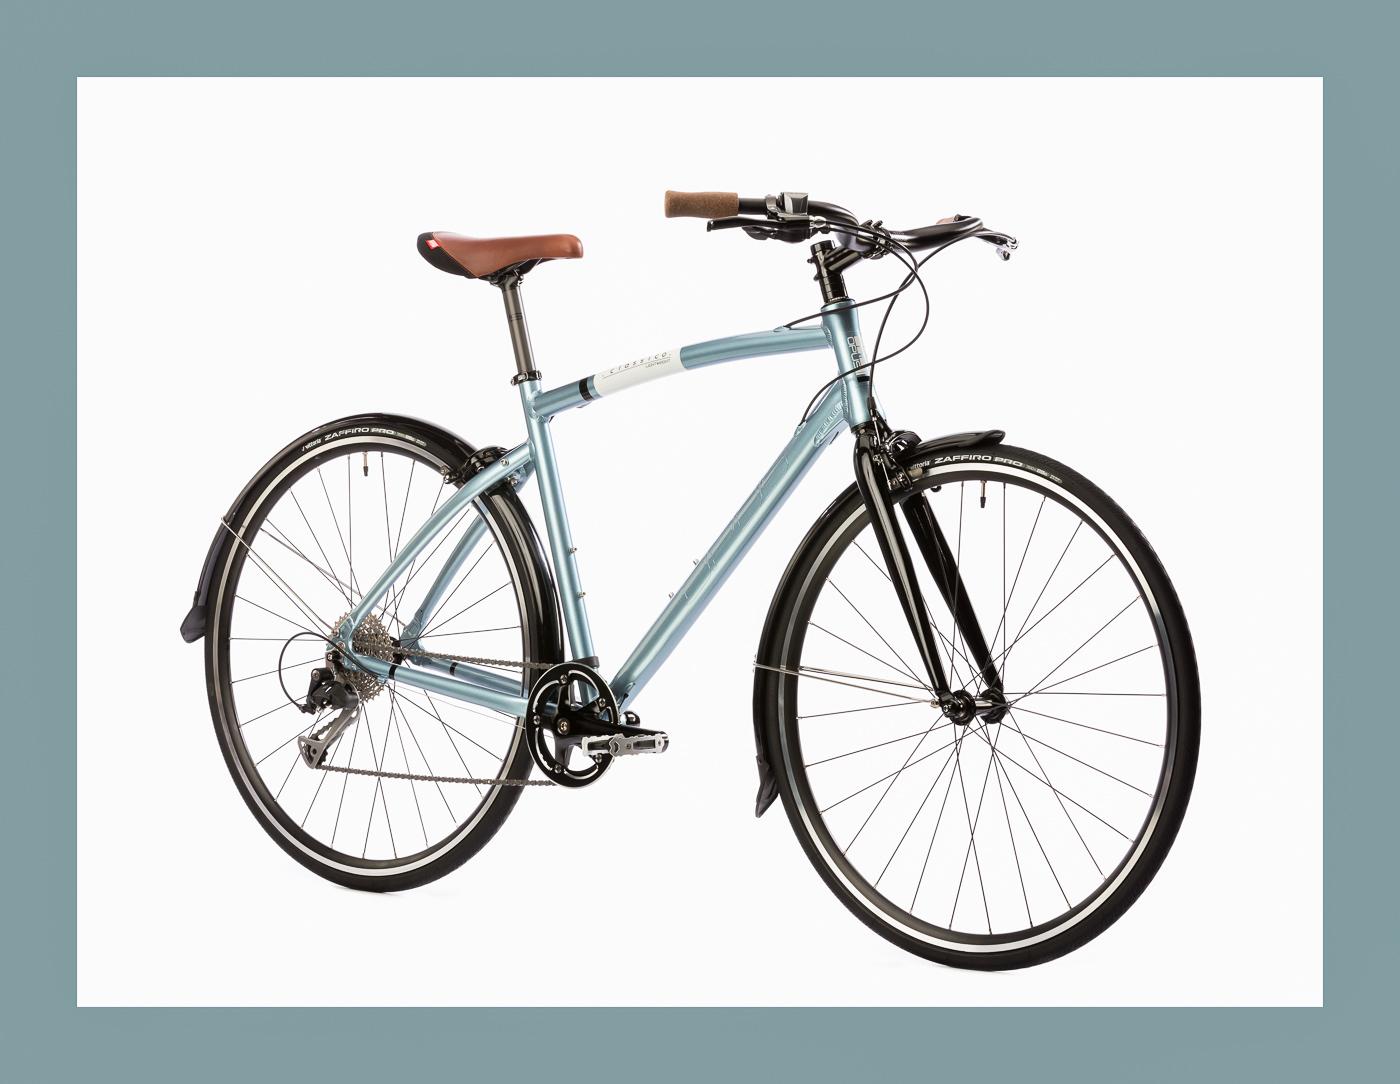 Vélo urbain Opus bike modele classico lightweight bleu pale